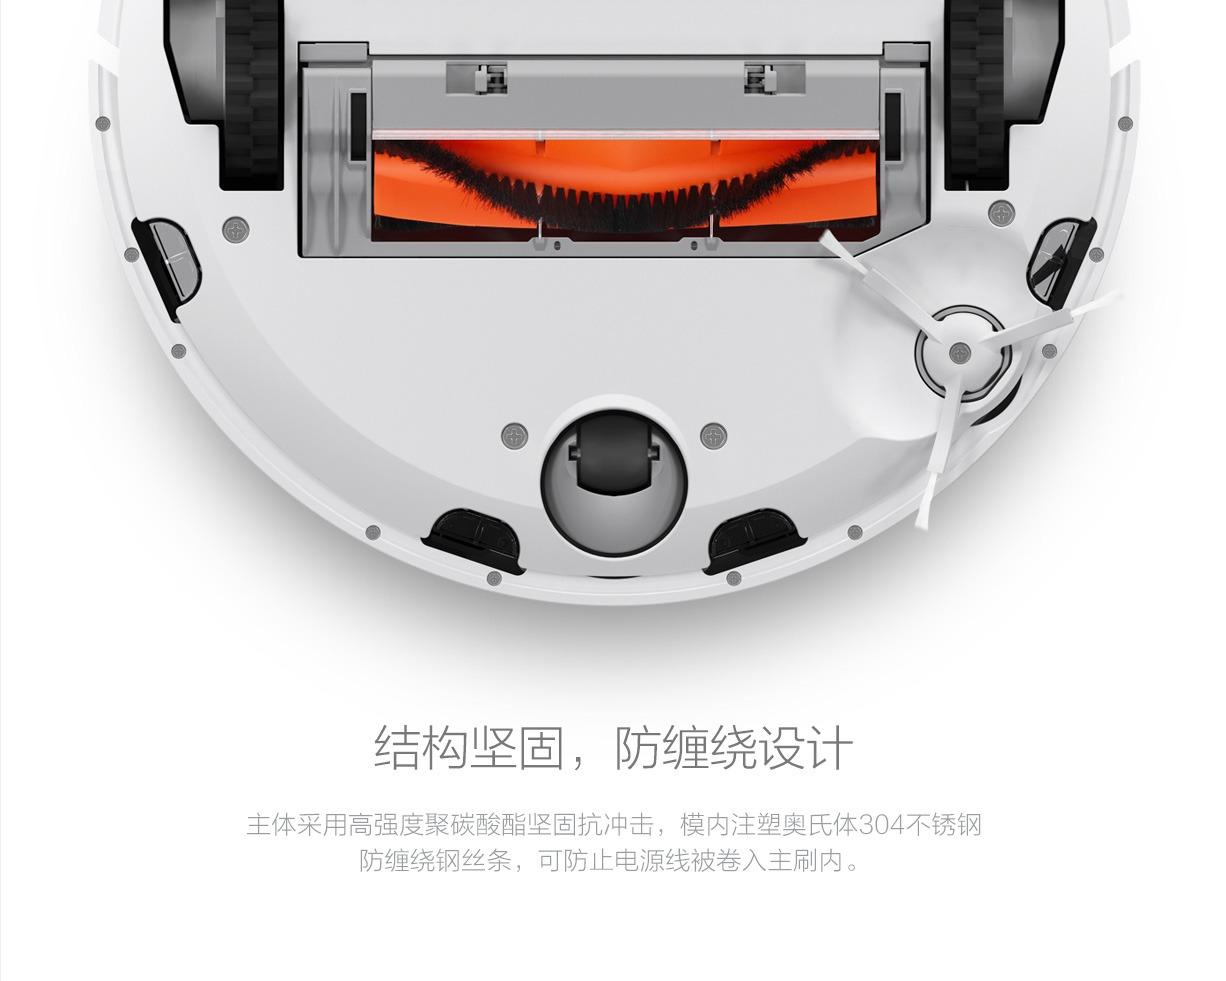 product_奇妙_米家扫地机器人主刷罩